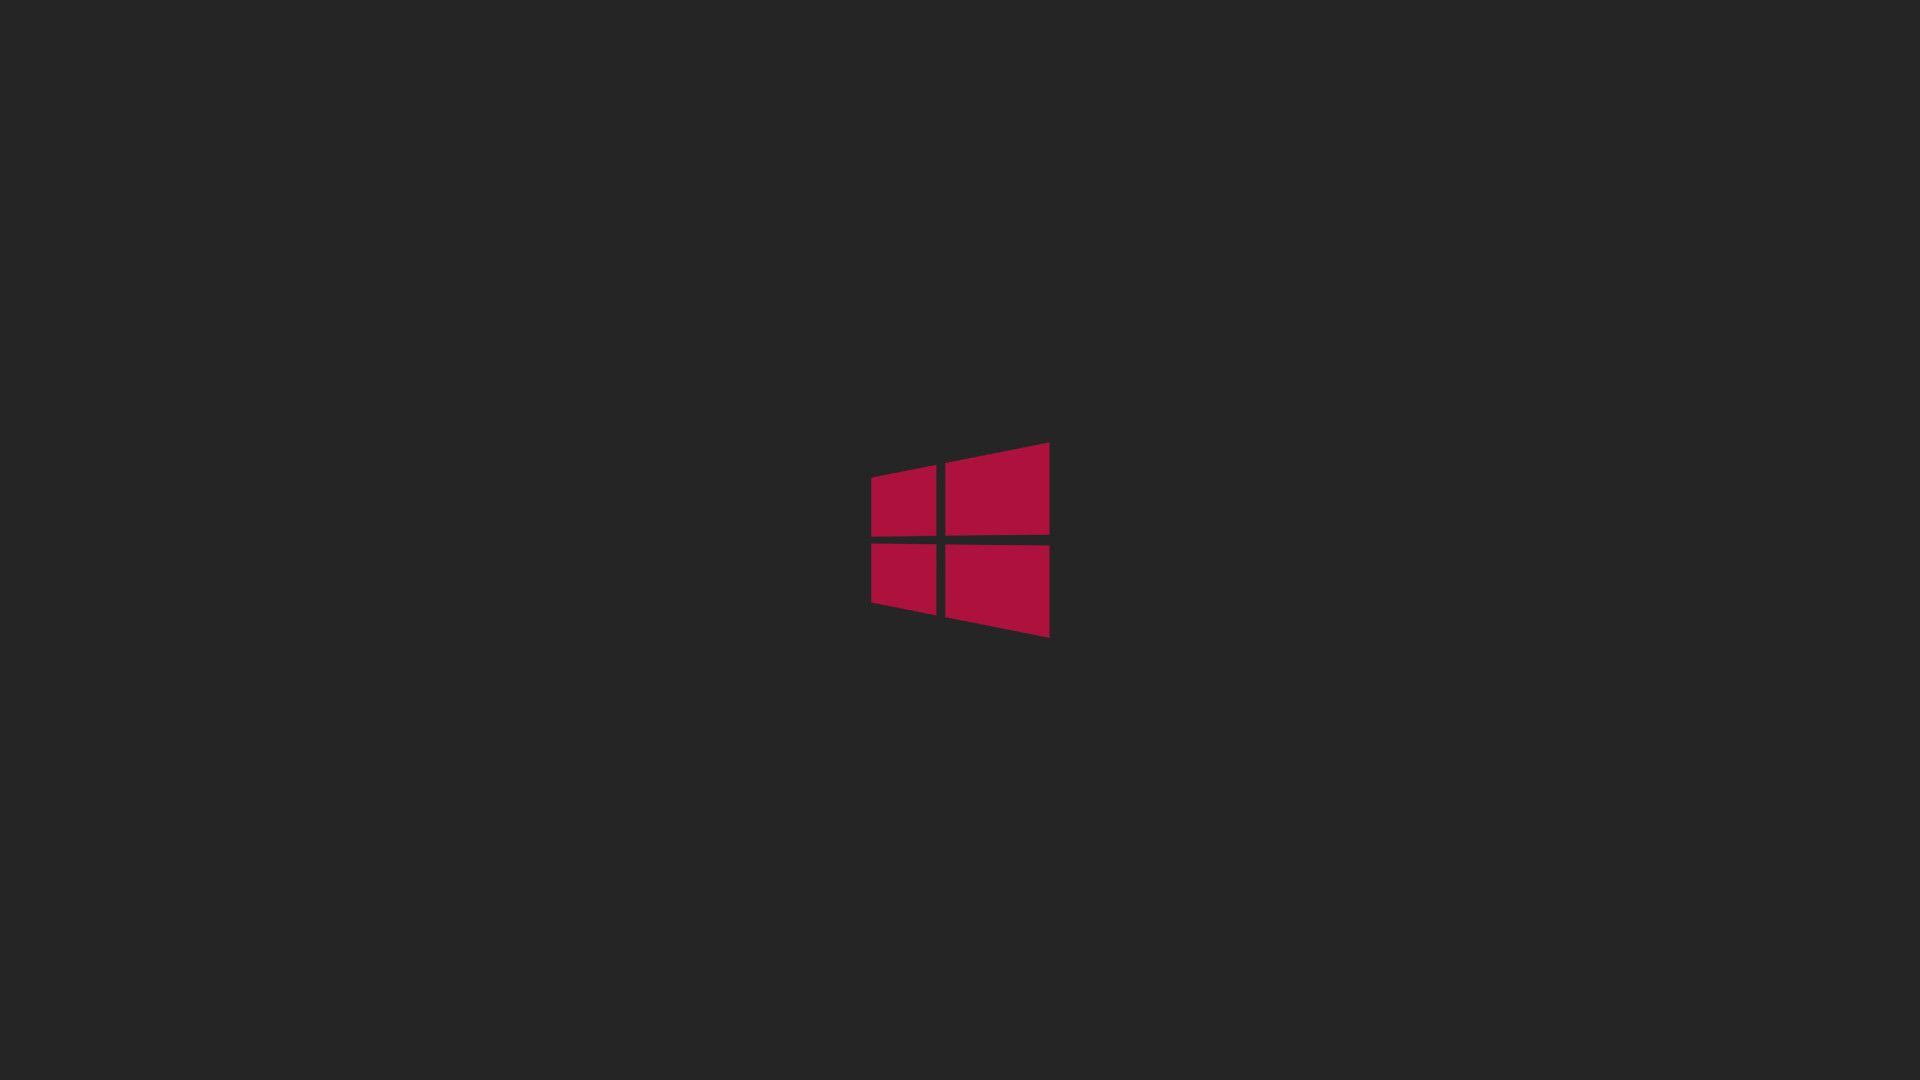 1920x1080 5 2 Background Hd Wallpaper Windows Wallpaper Wallpaper Windows 10